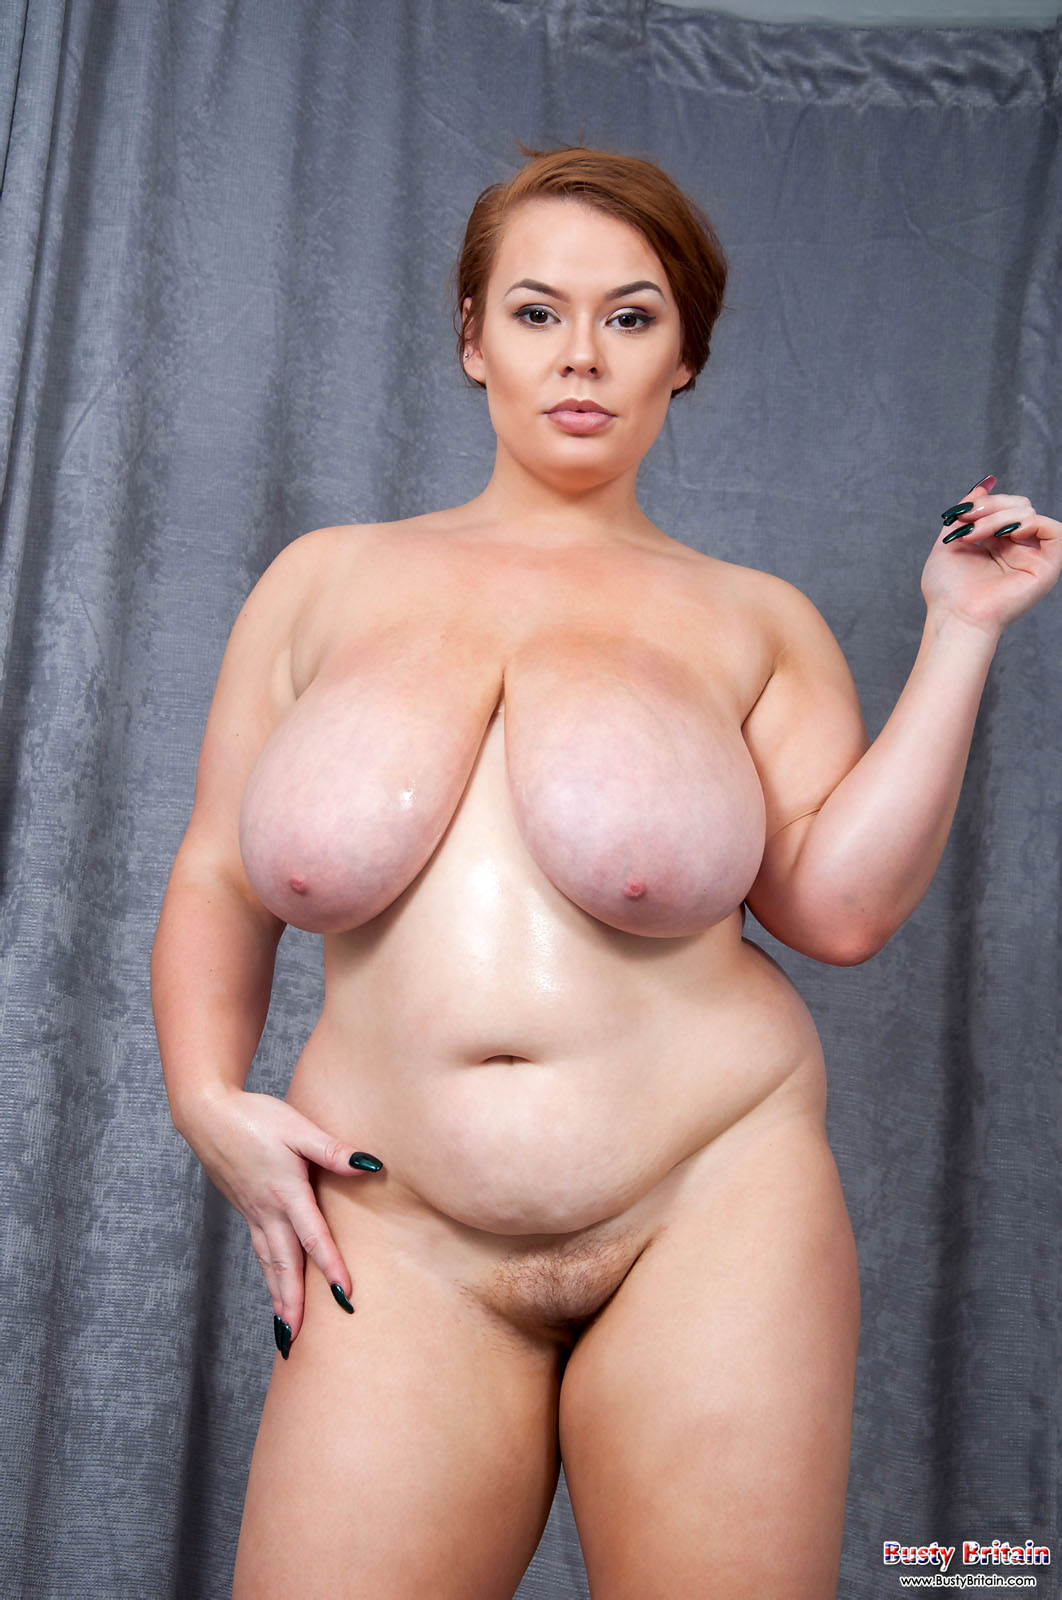 young latina and shot nude